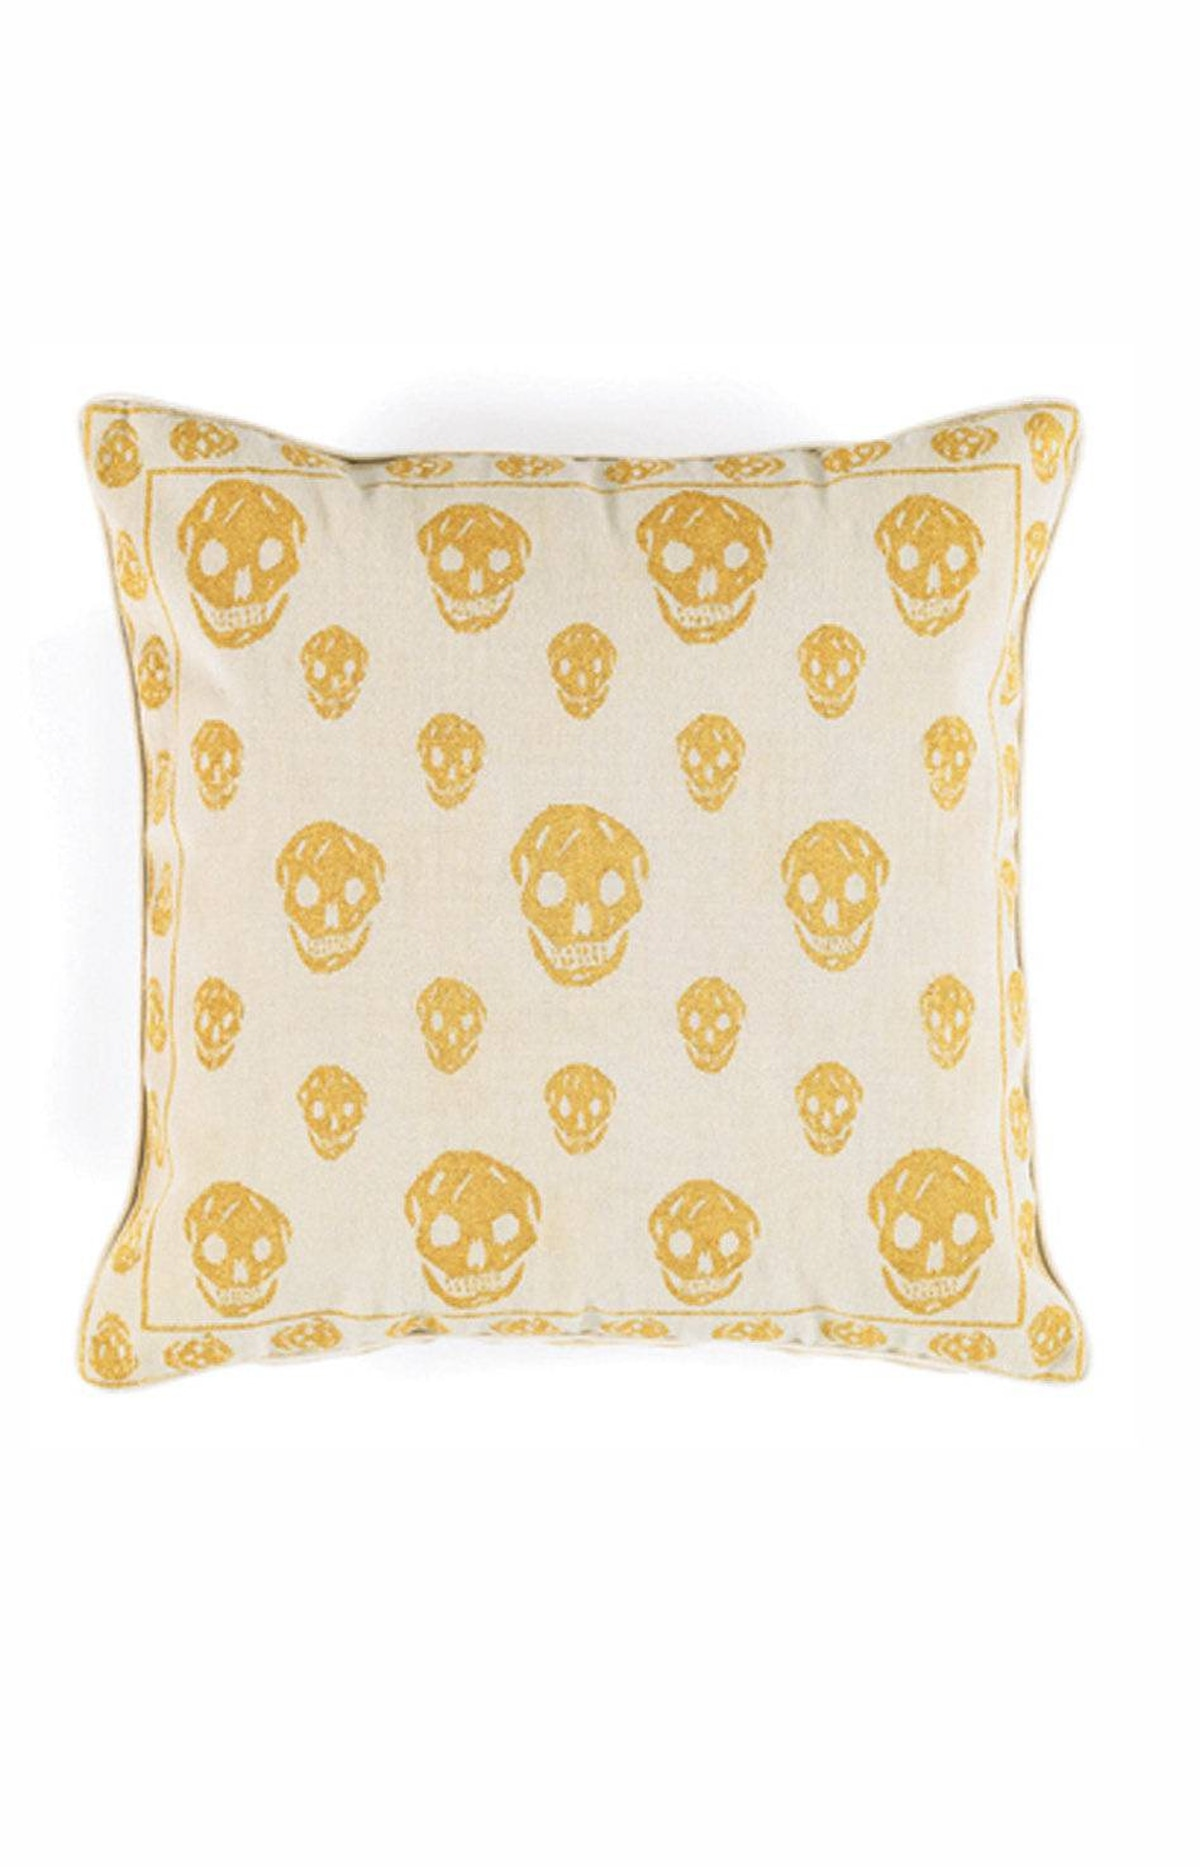 Alexander McQueen Skull pillow in Gold, $709 at Avenue Road.